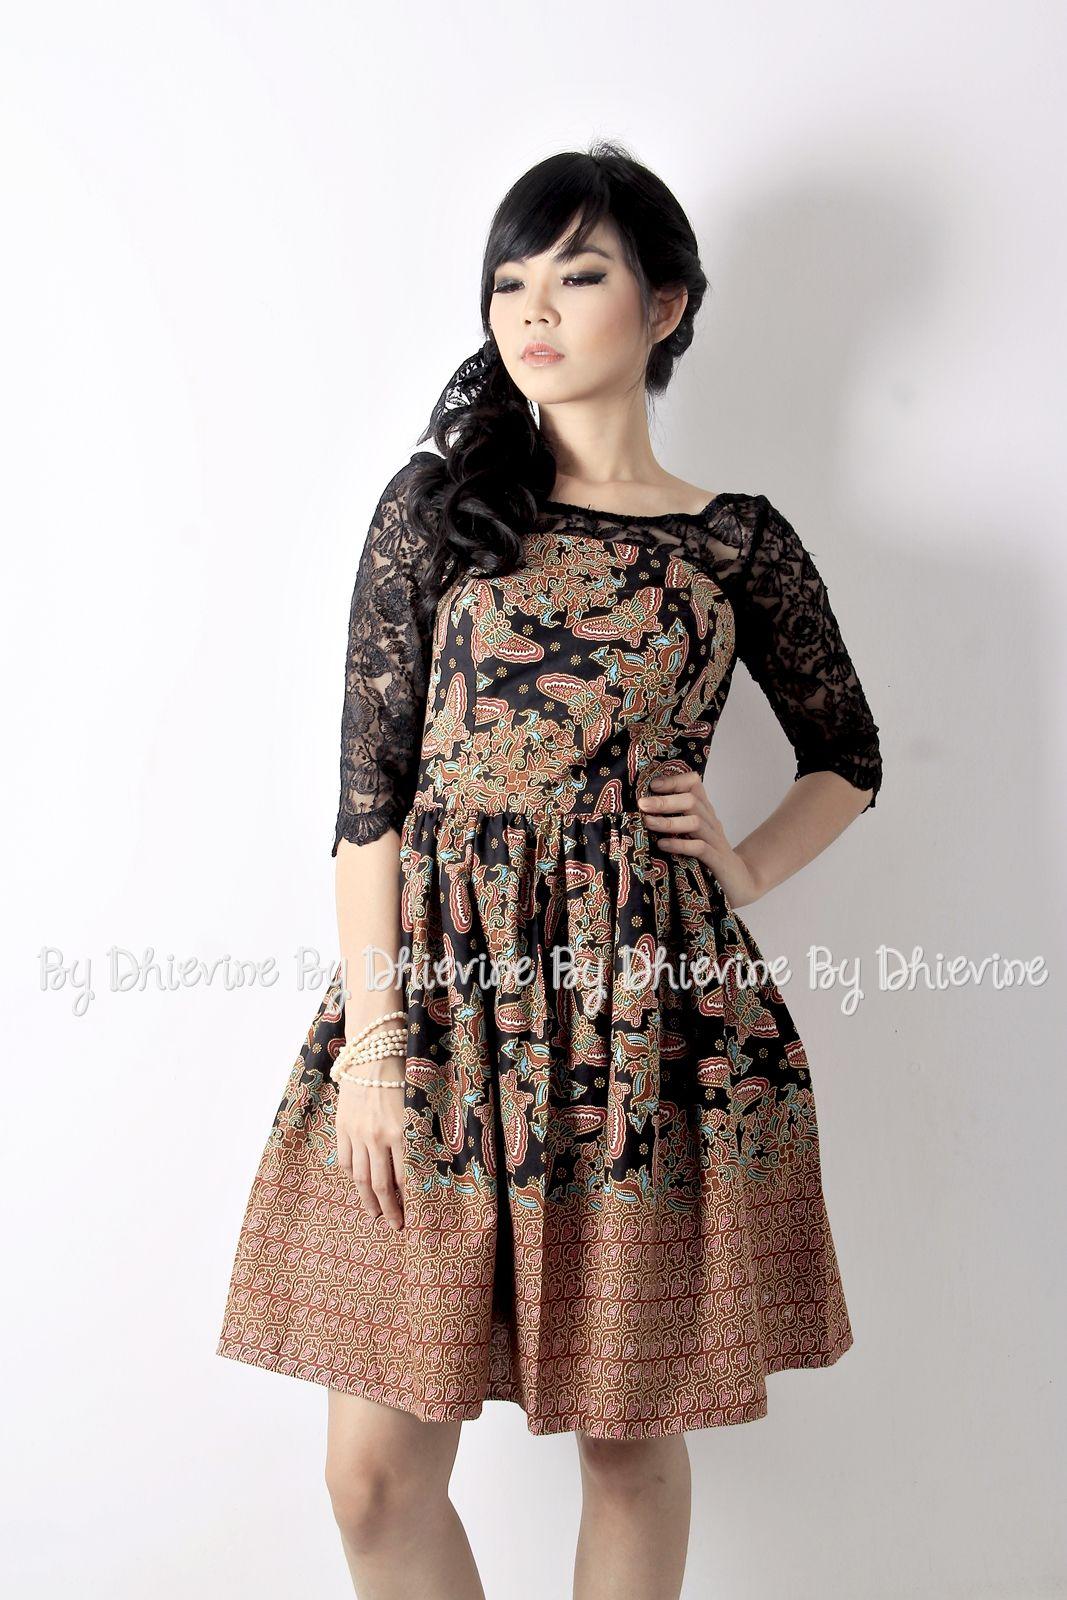 Modern dress casual - Batik Dress Kebaya Dress Pendapa Batik Black Dress Dhievine Redefine You